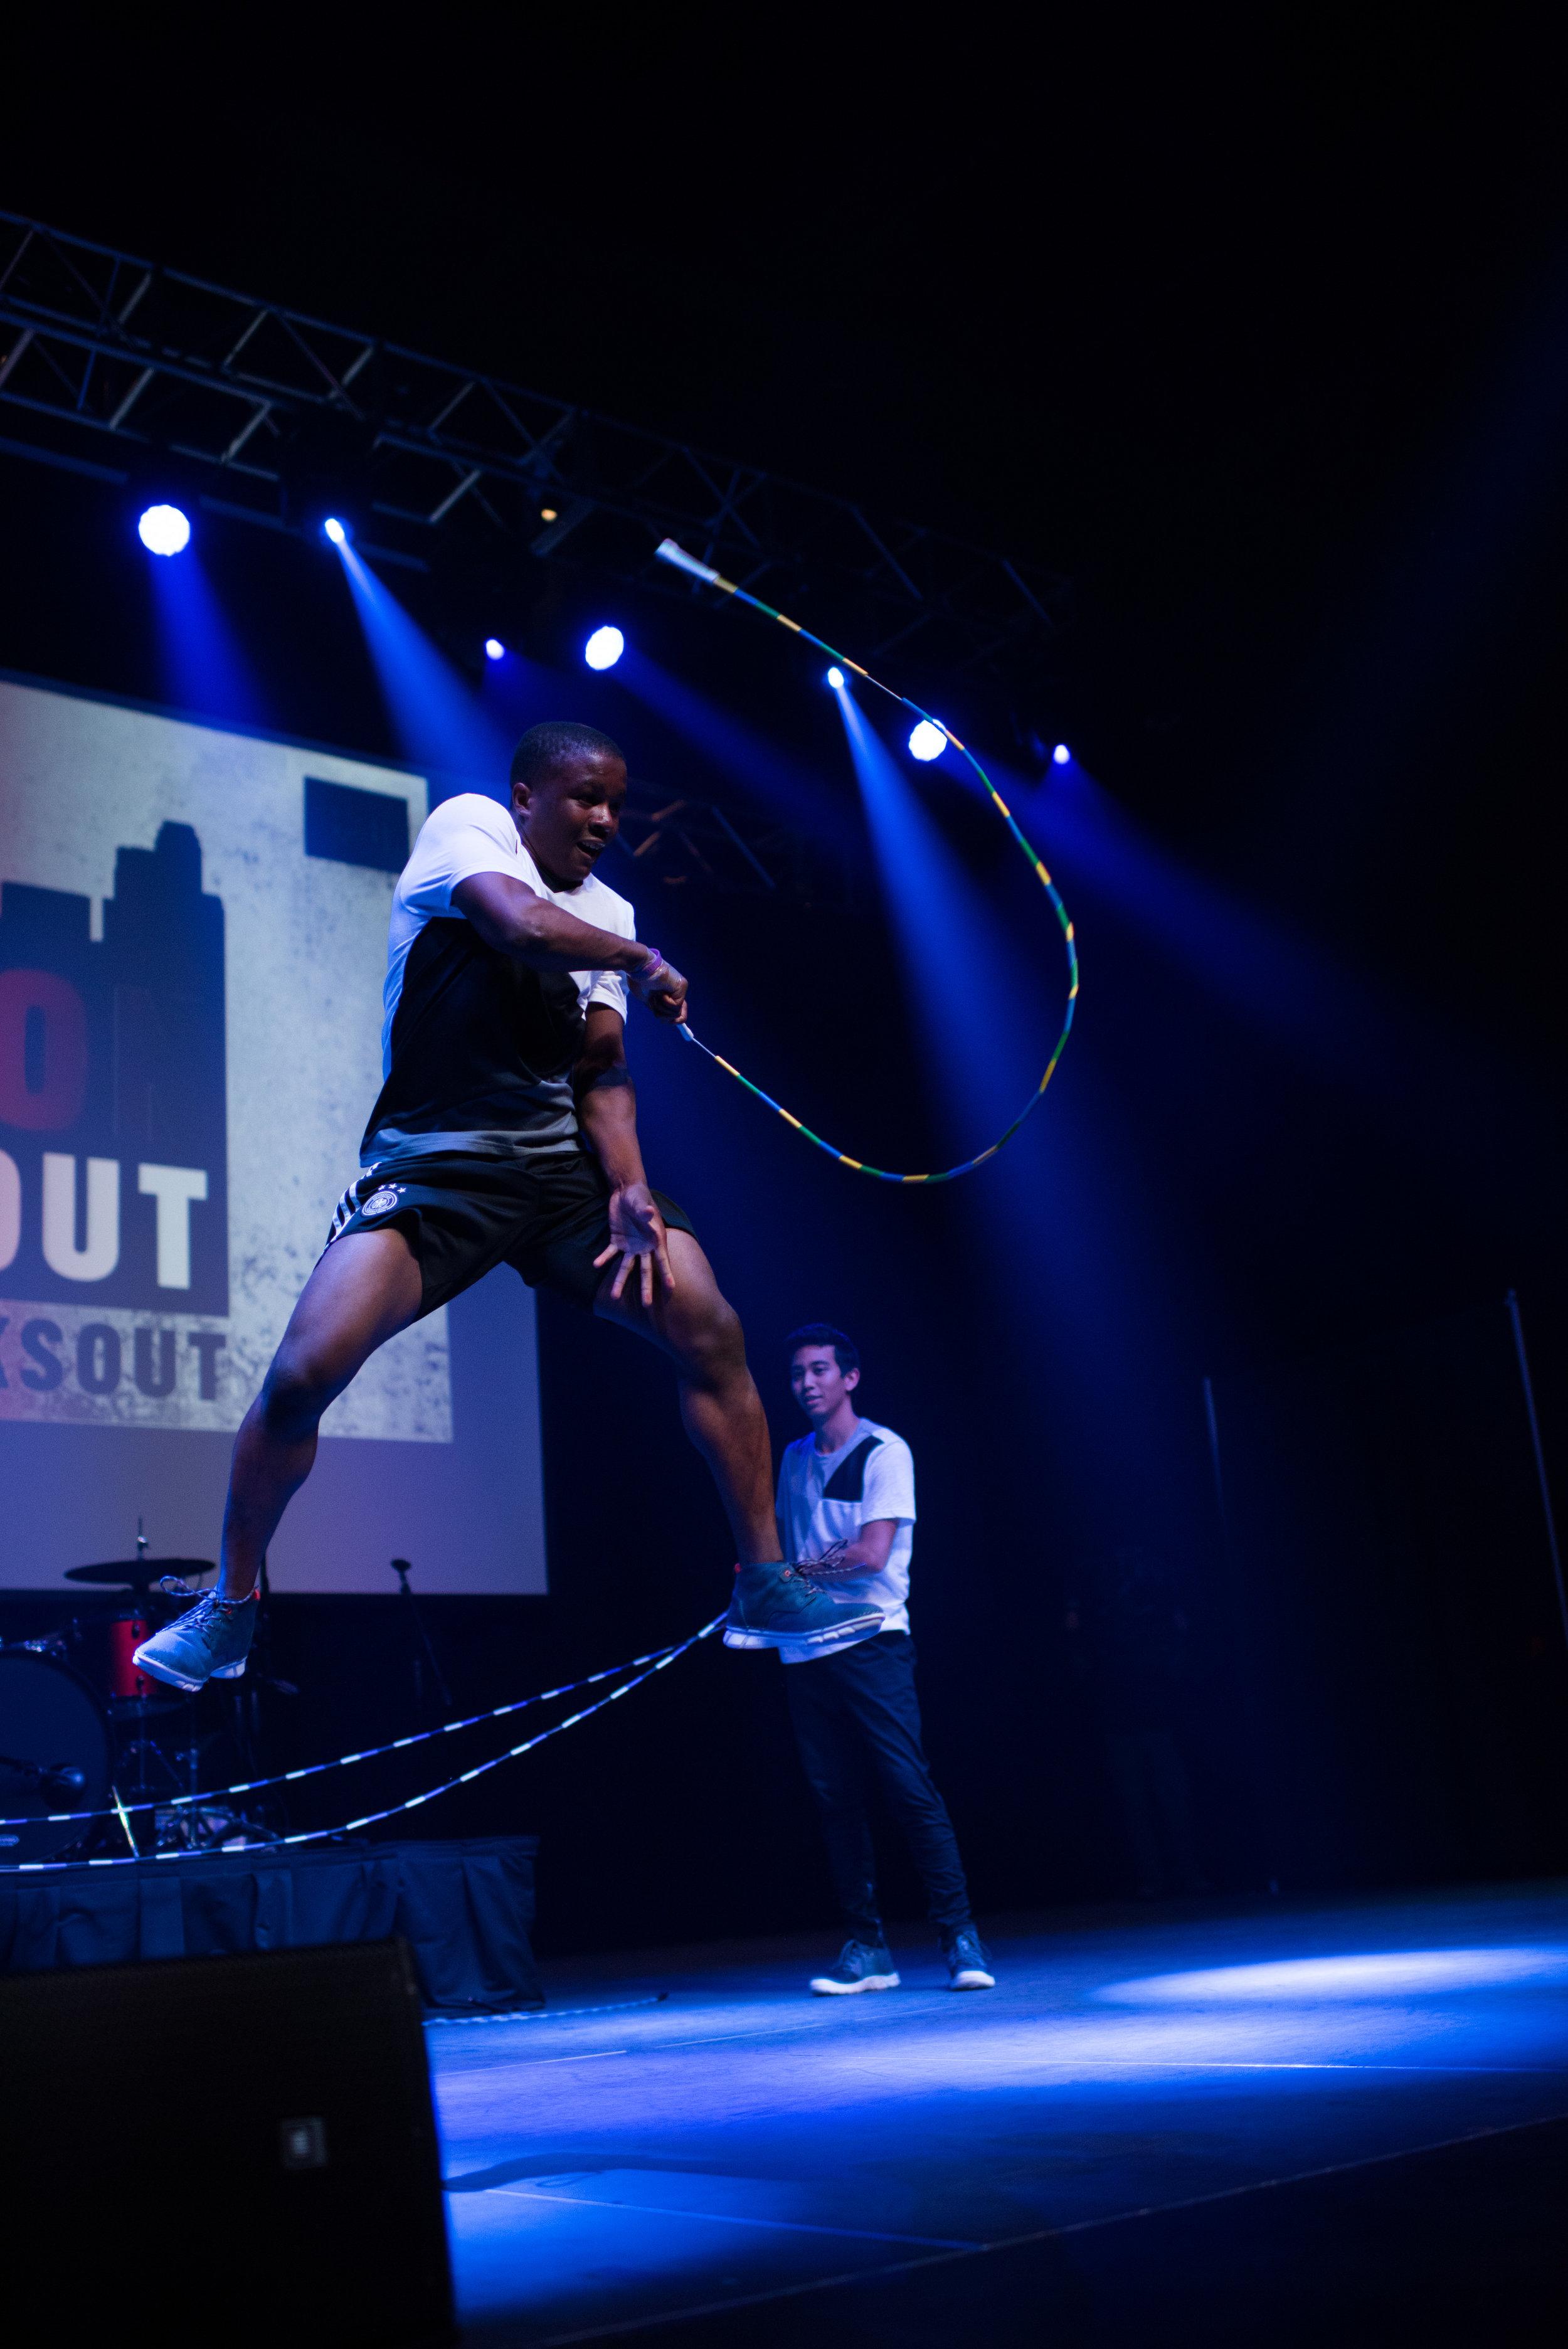 jump rope performance